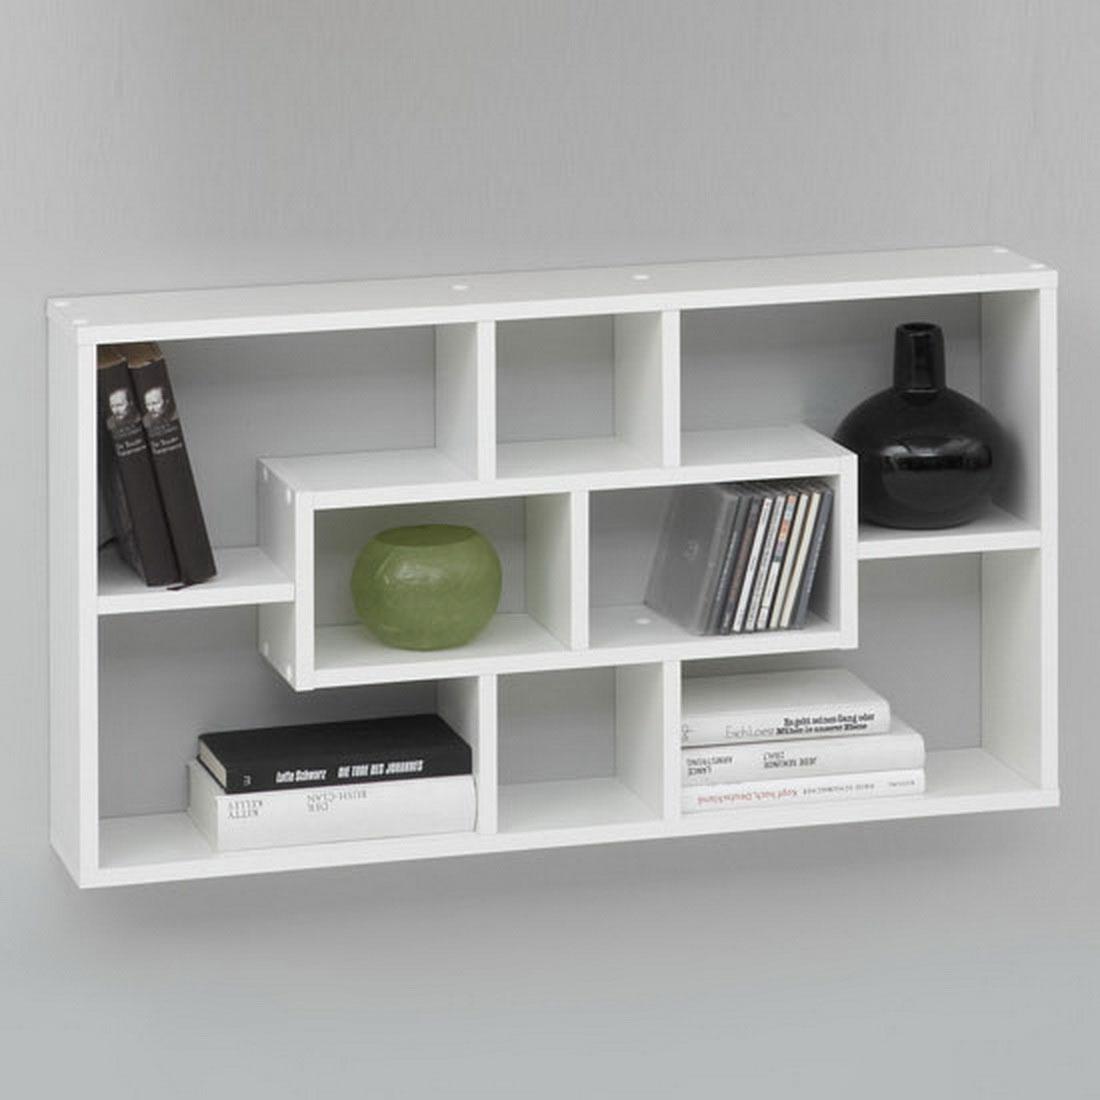 29 Brilliant Hanging Bookshelf Design Ideas That Will Revamp Your Regarding Bookshelf Designs For Home (#3 of 15)